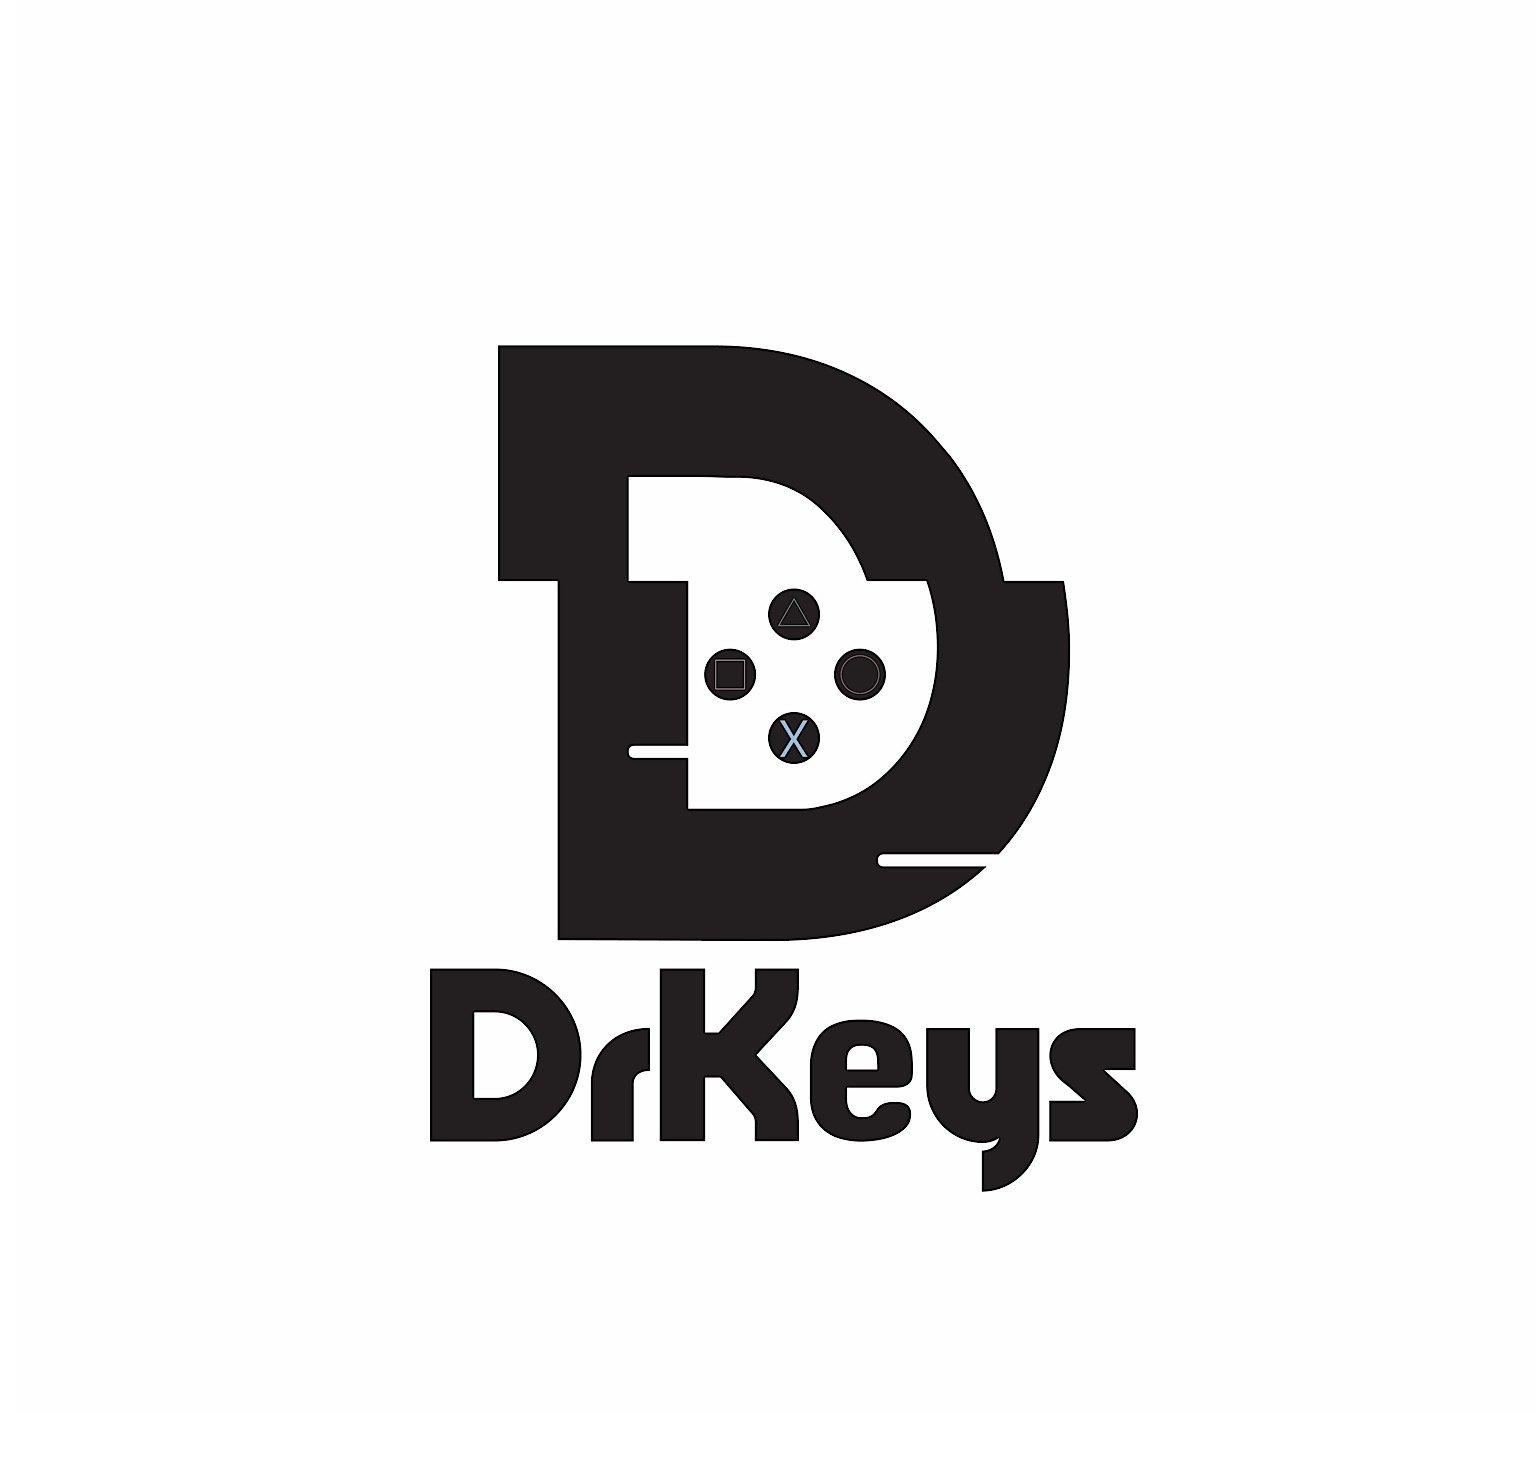 Dr. Keys